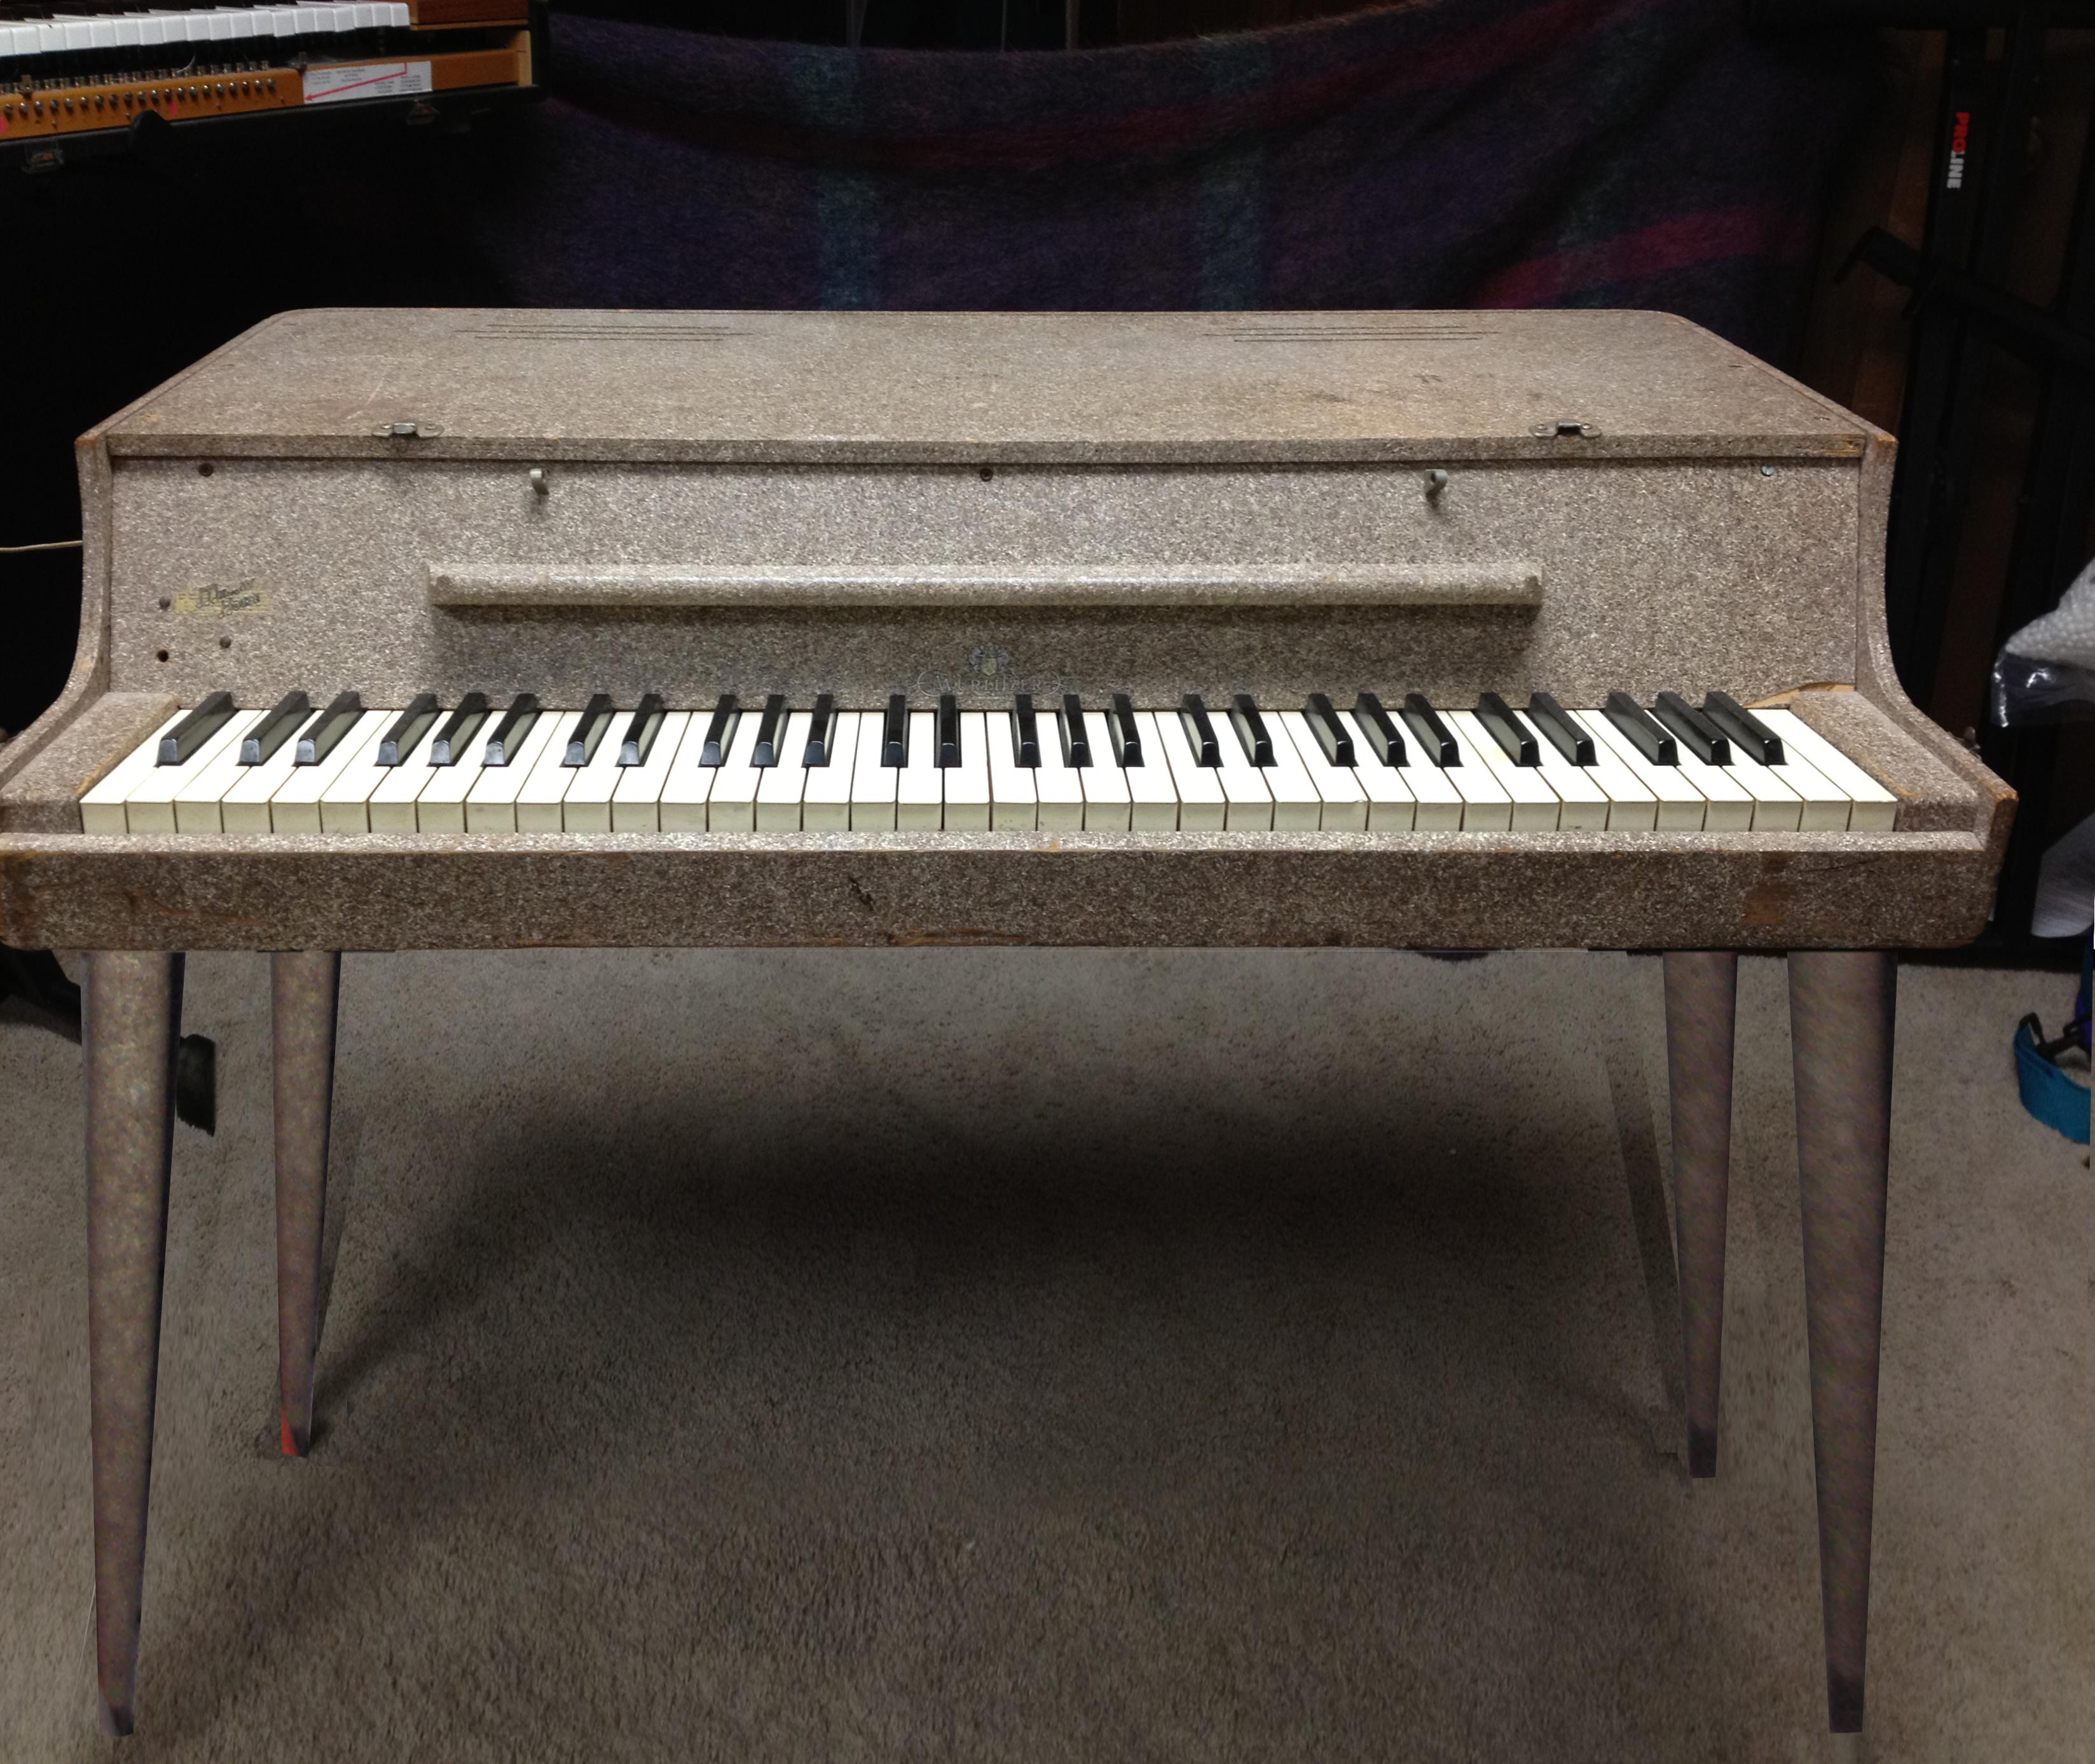 File:Wurlitzer Electronic Piano model 112 (with original